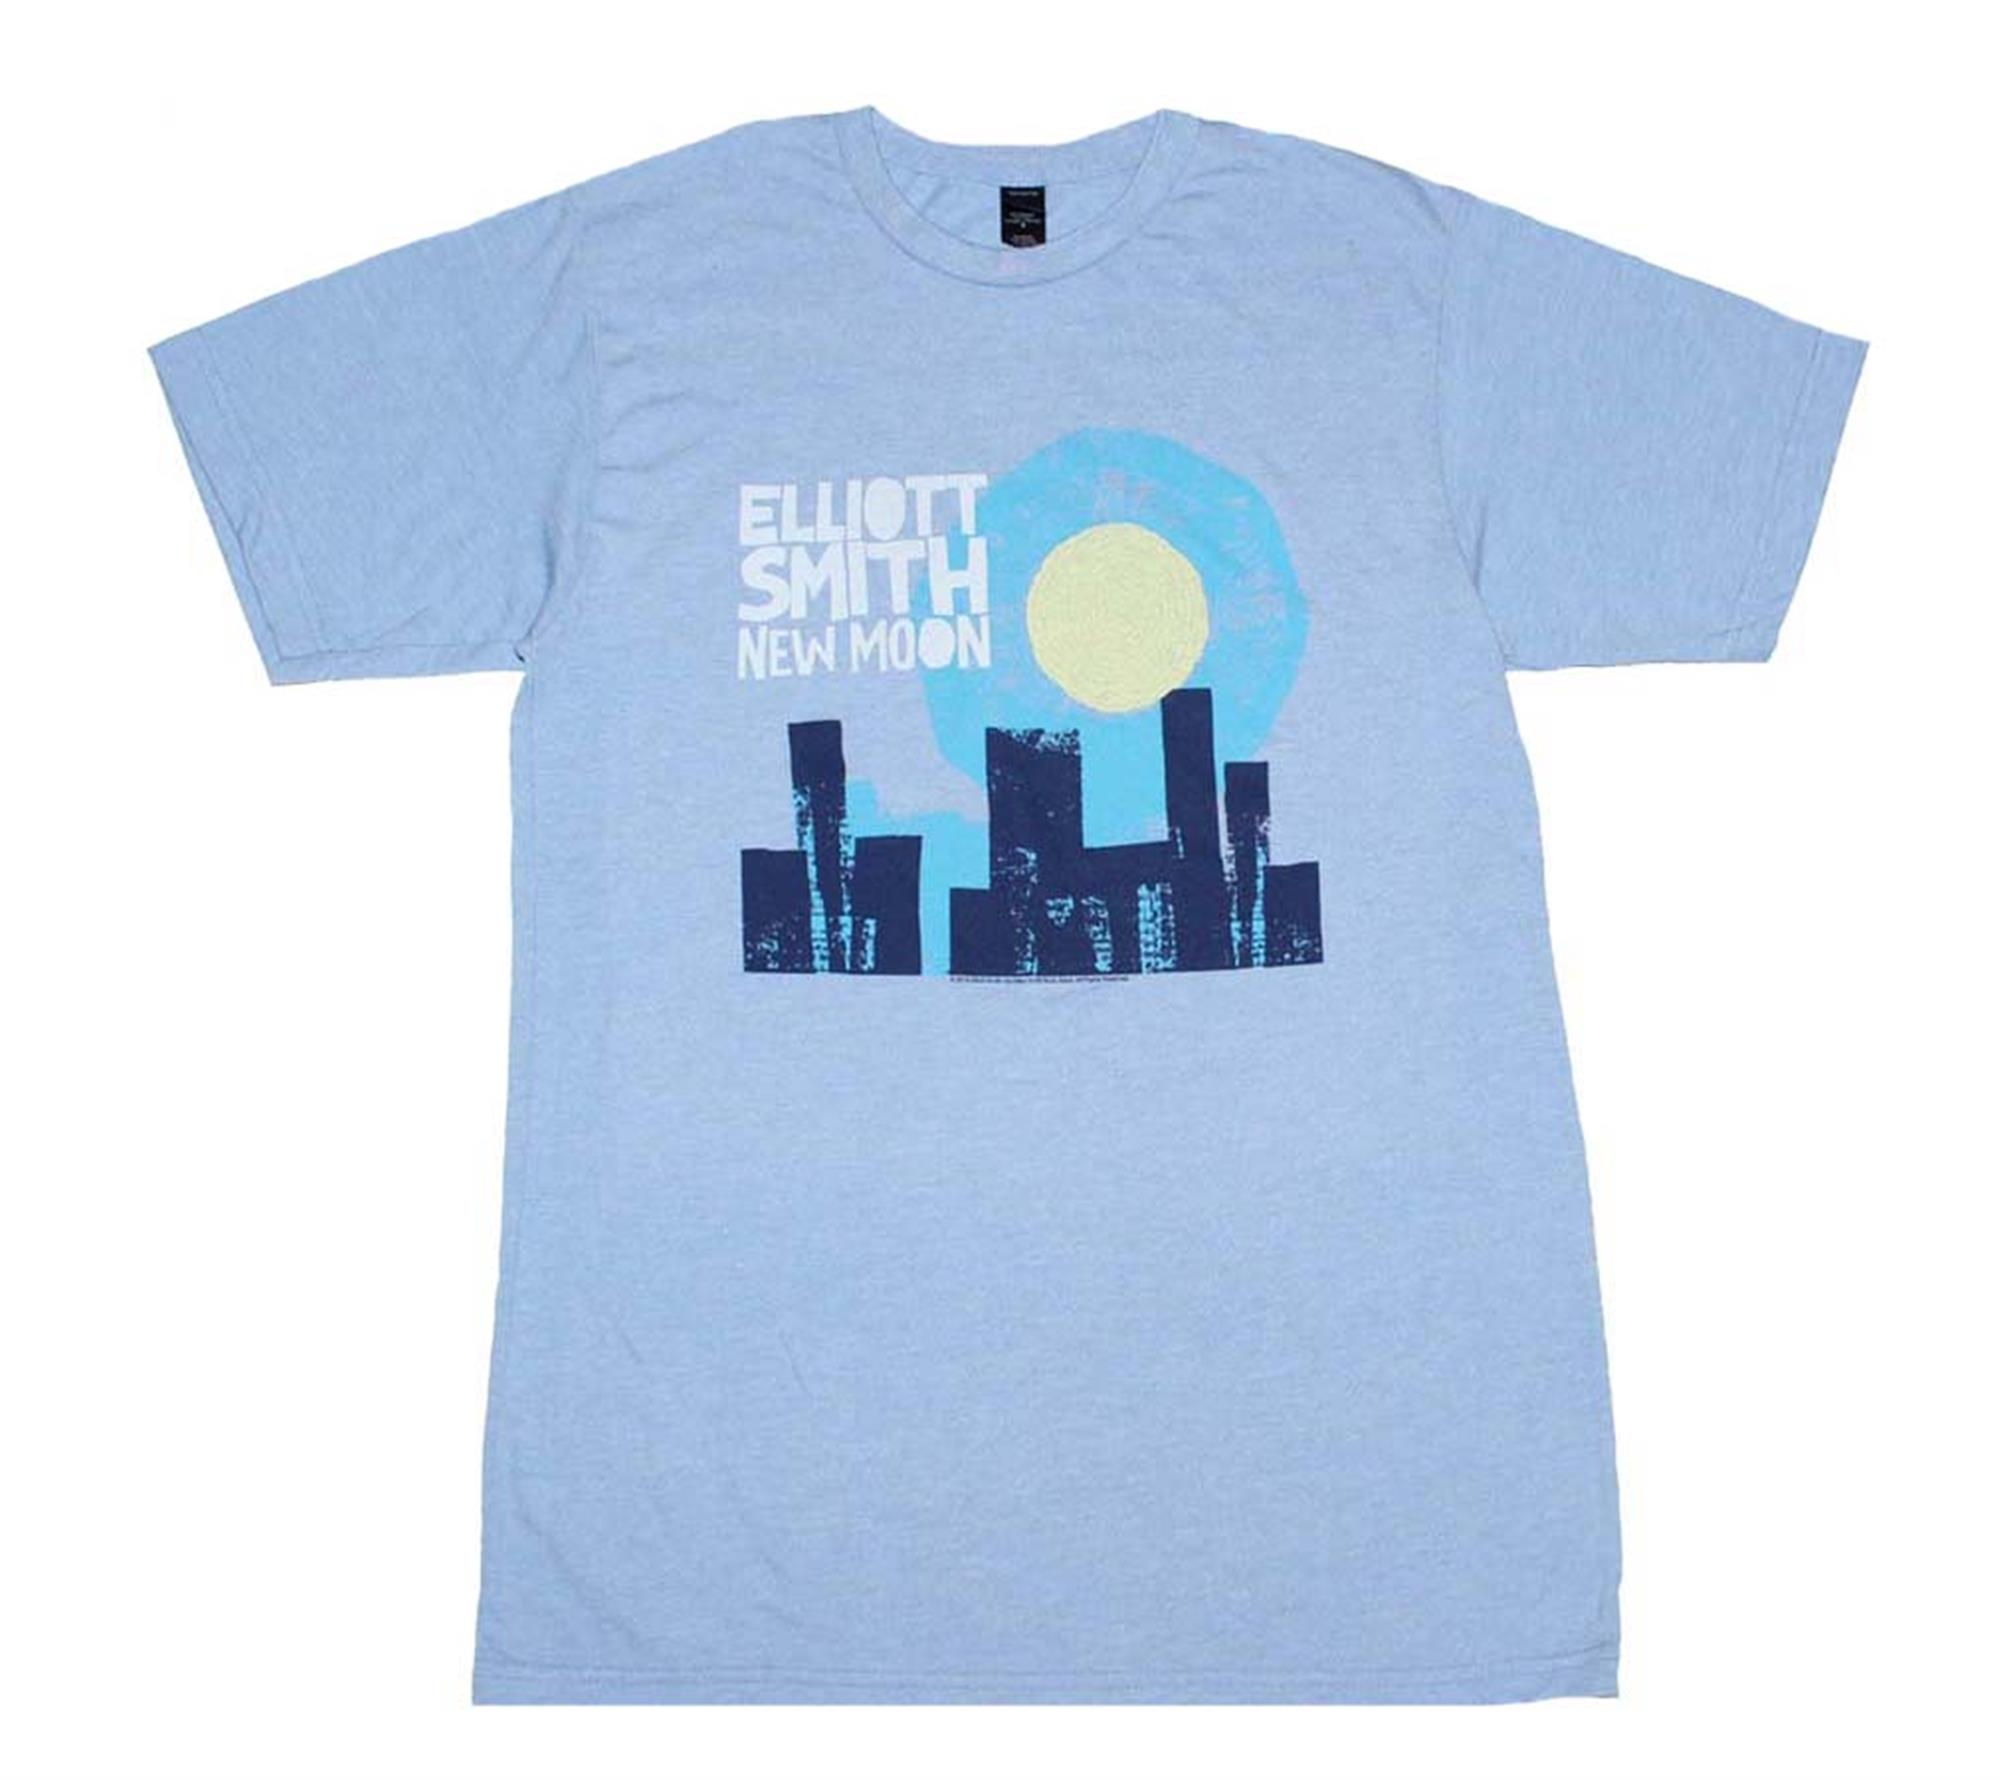 Elliott Smith New Moon T-Shirt